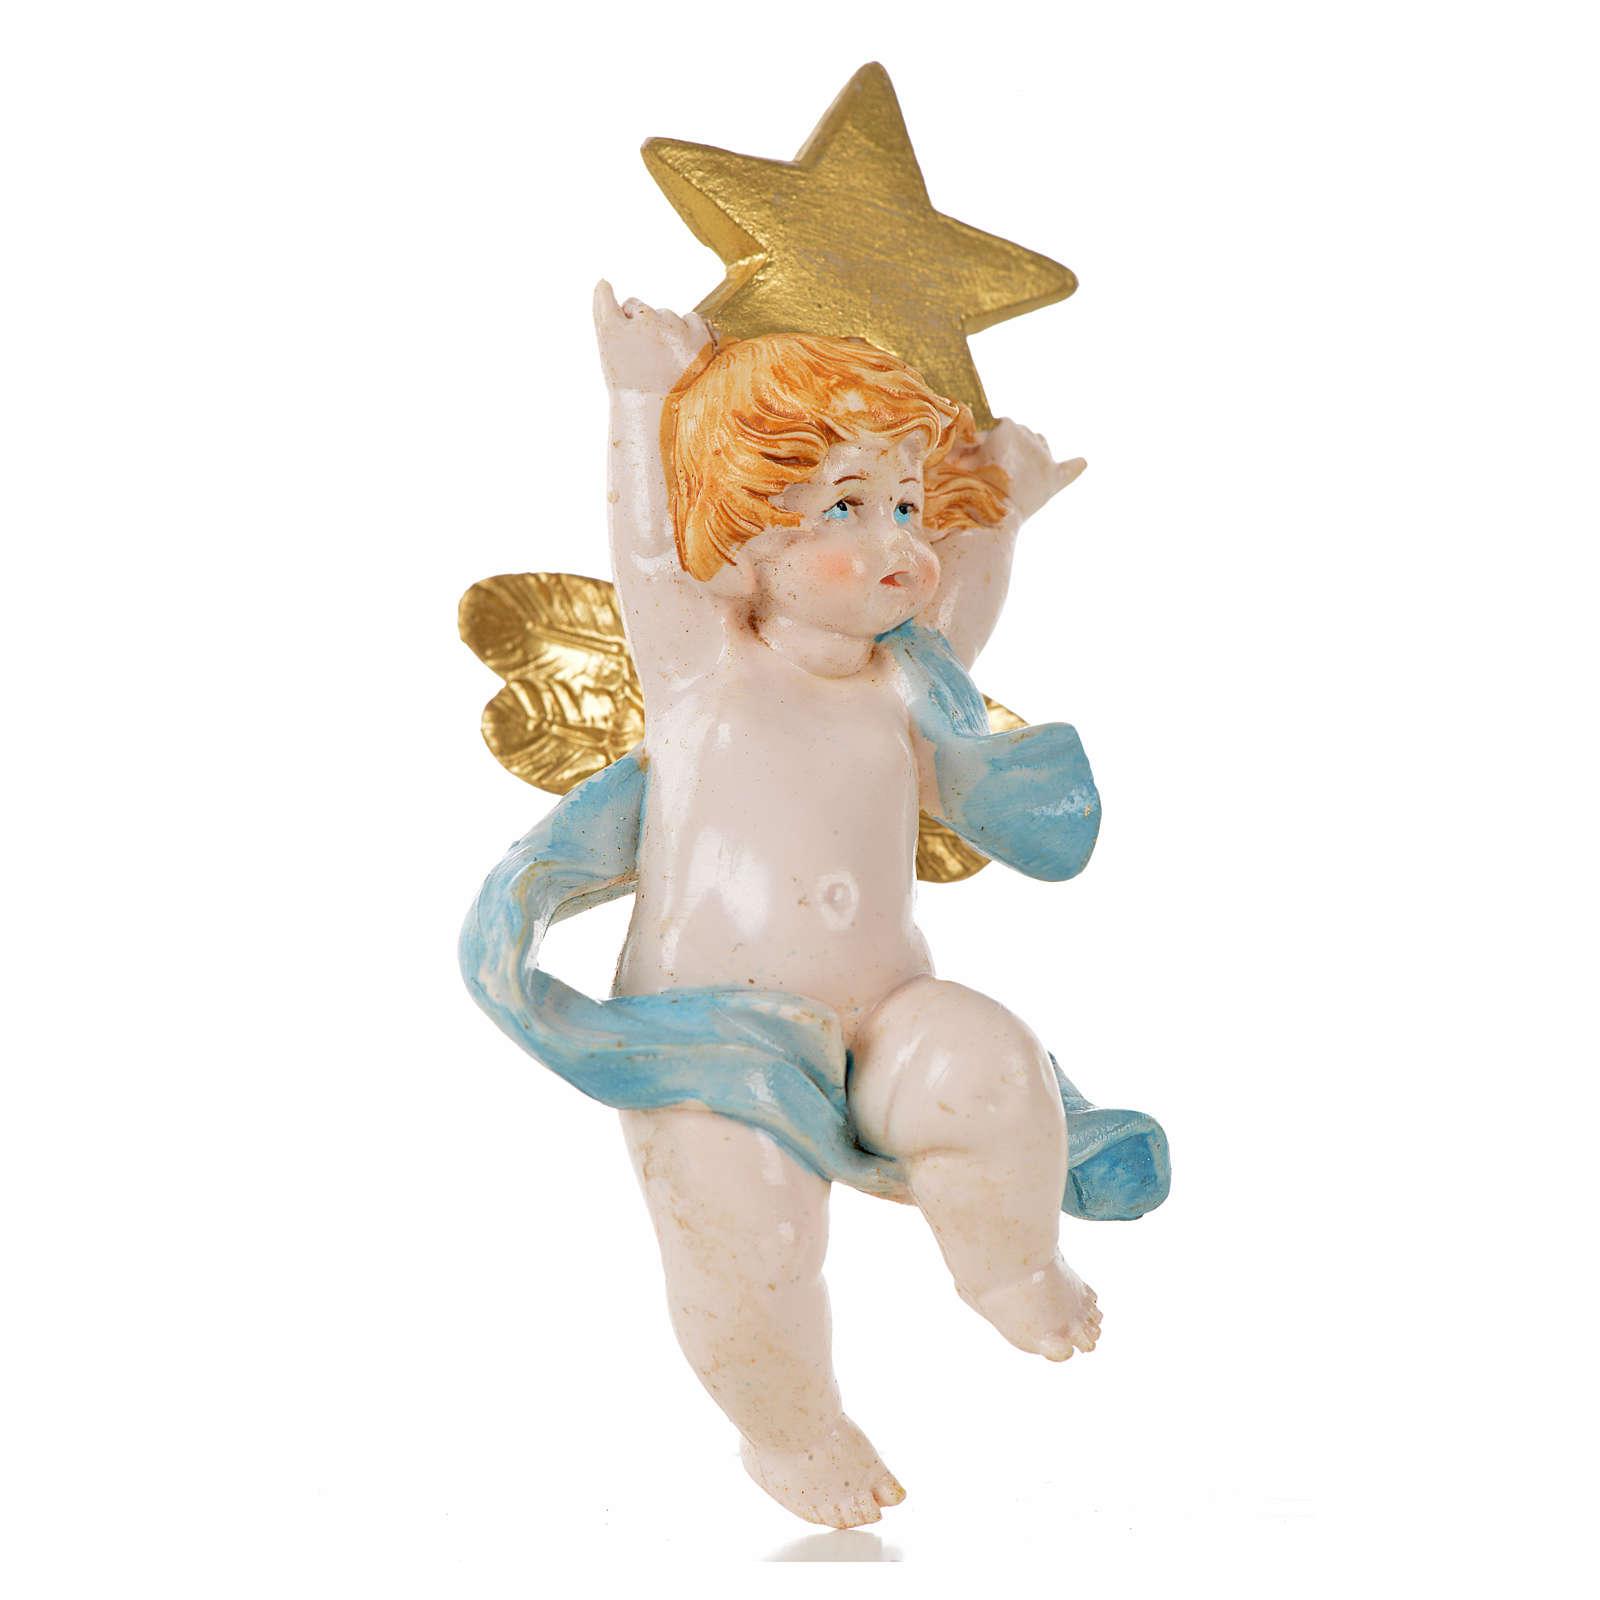 Ange bleu avec étoile 7 cm Fontanini type porcelaine 3